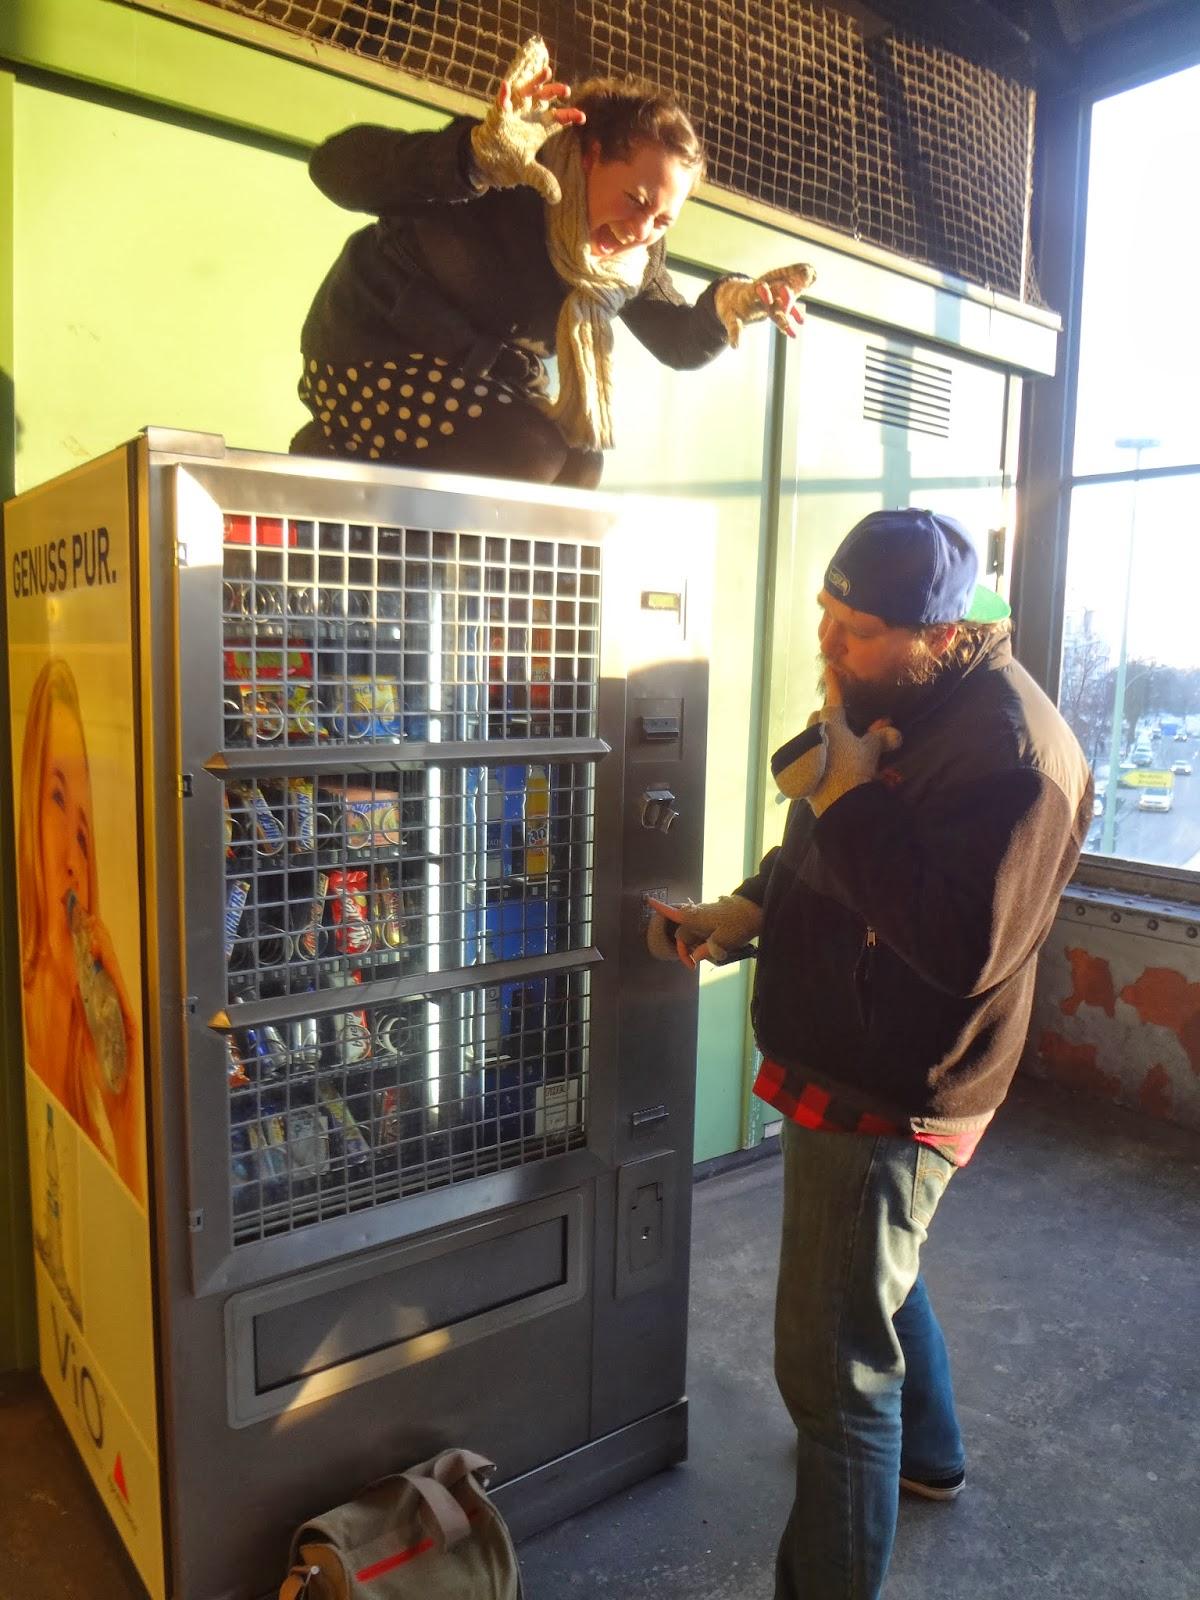 Drinking Tour of the Berlin U-Bahn